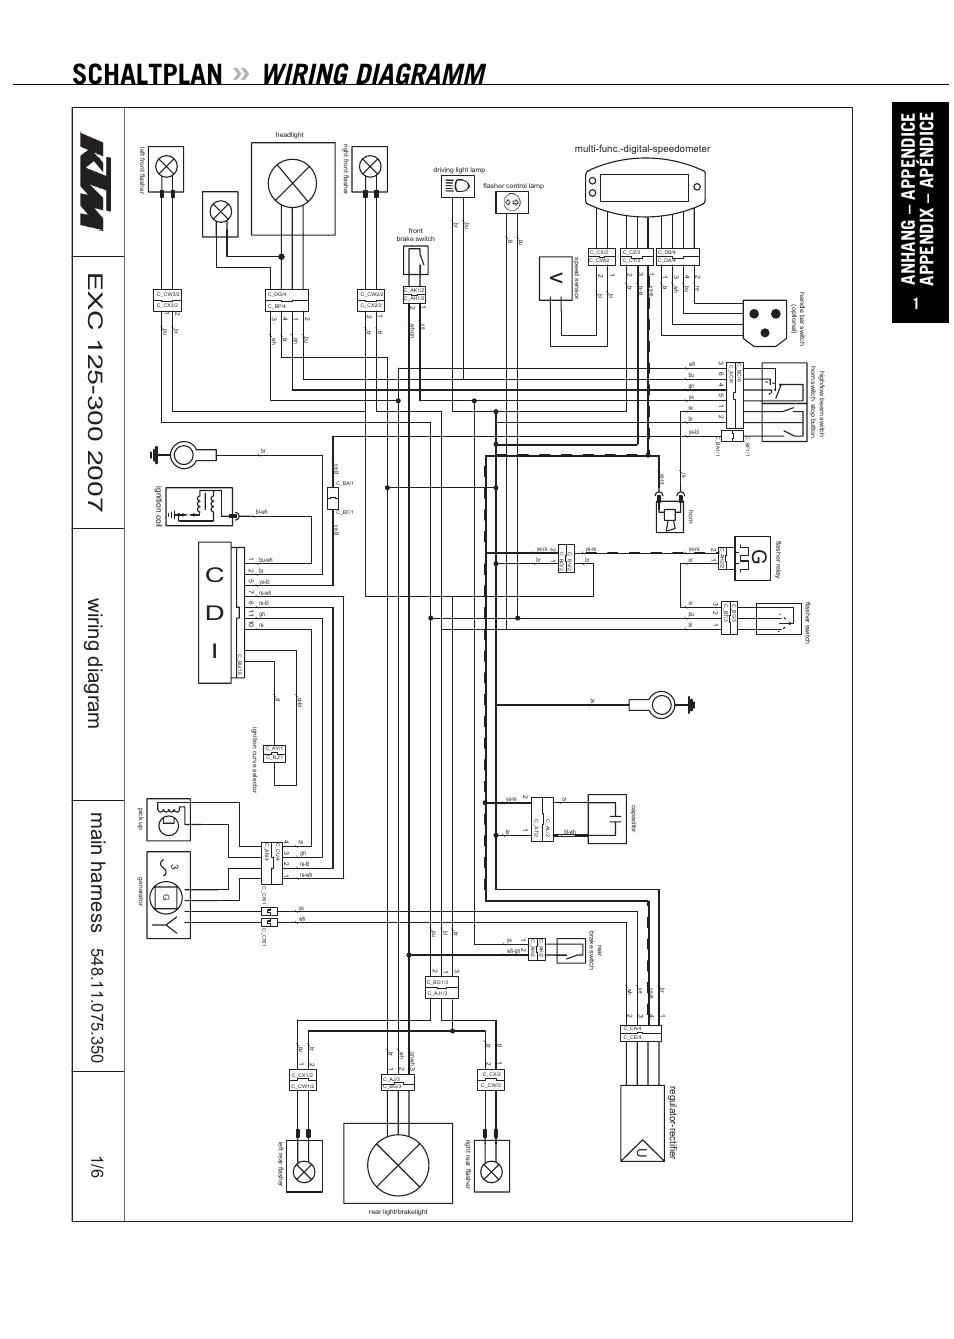 medium resolution of schaltplan wiring diagramm cd i ktm exc 200 xc de user manual page 58 69